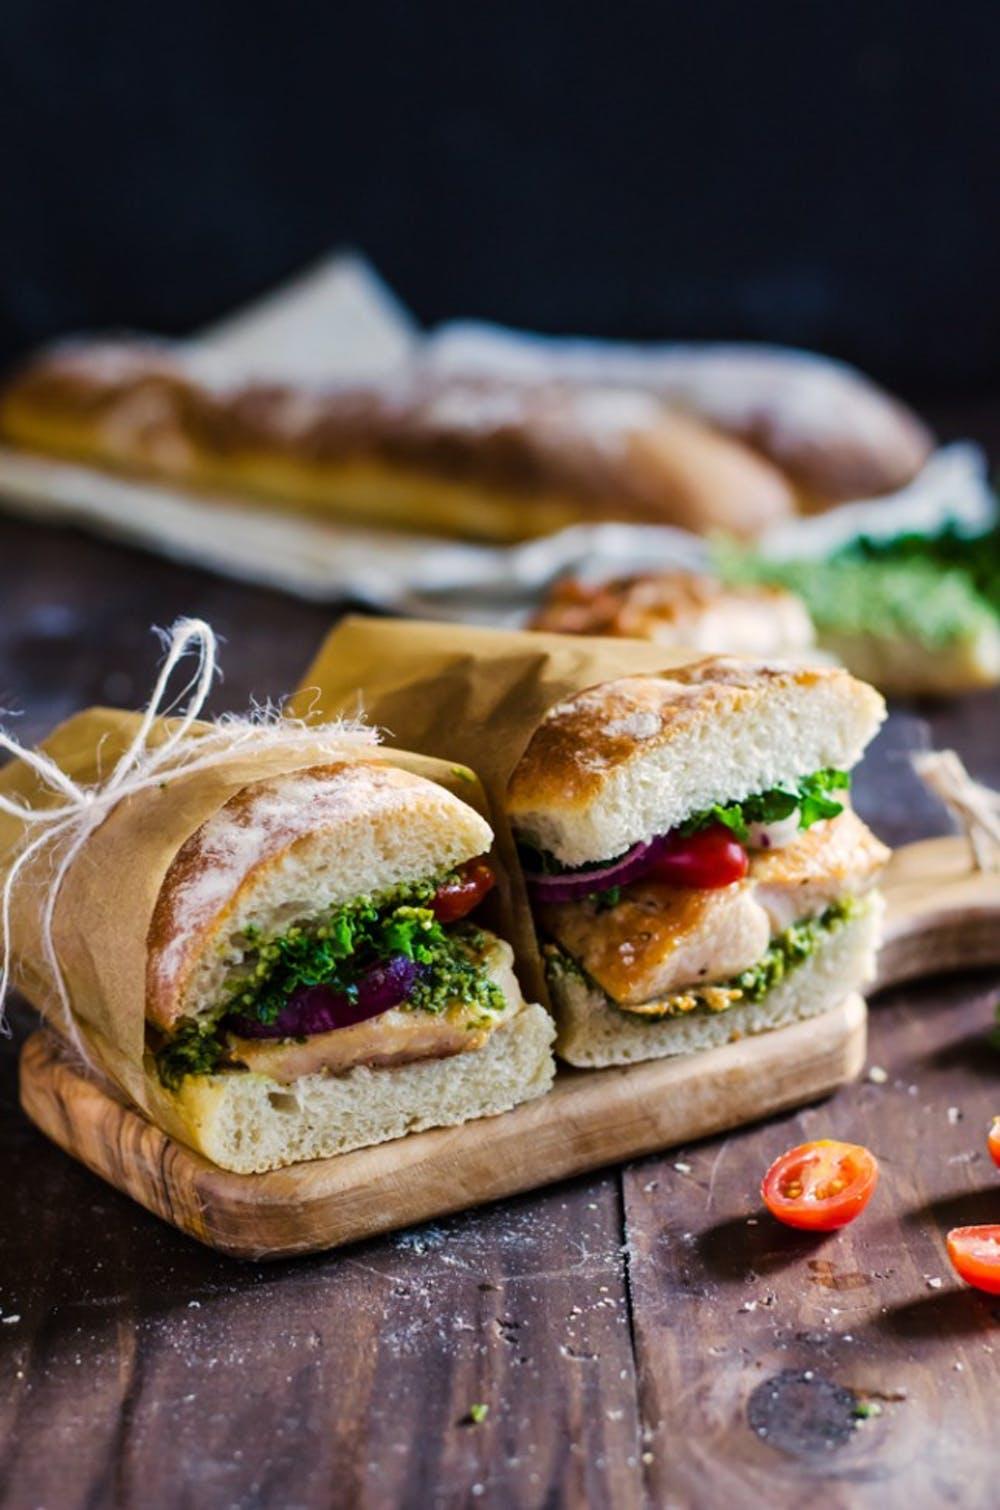 Stylish Sandwich Presentation Ideas That Will Amaze Anyone